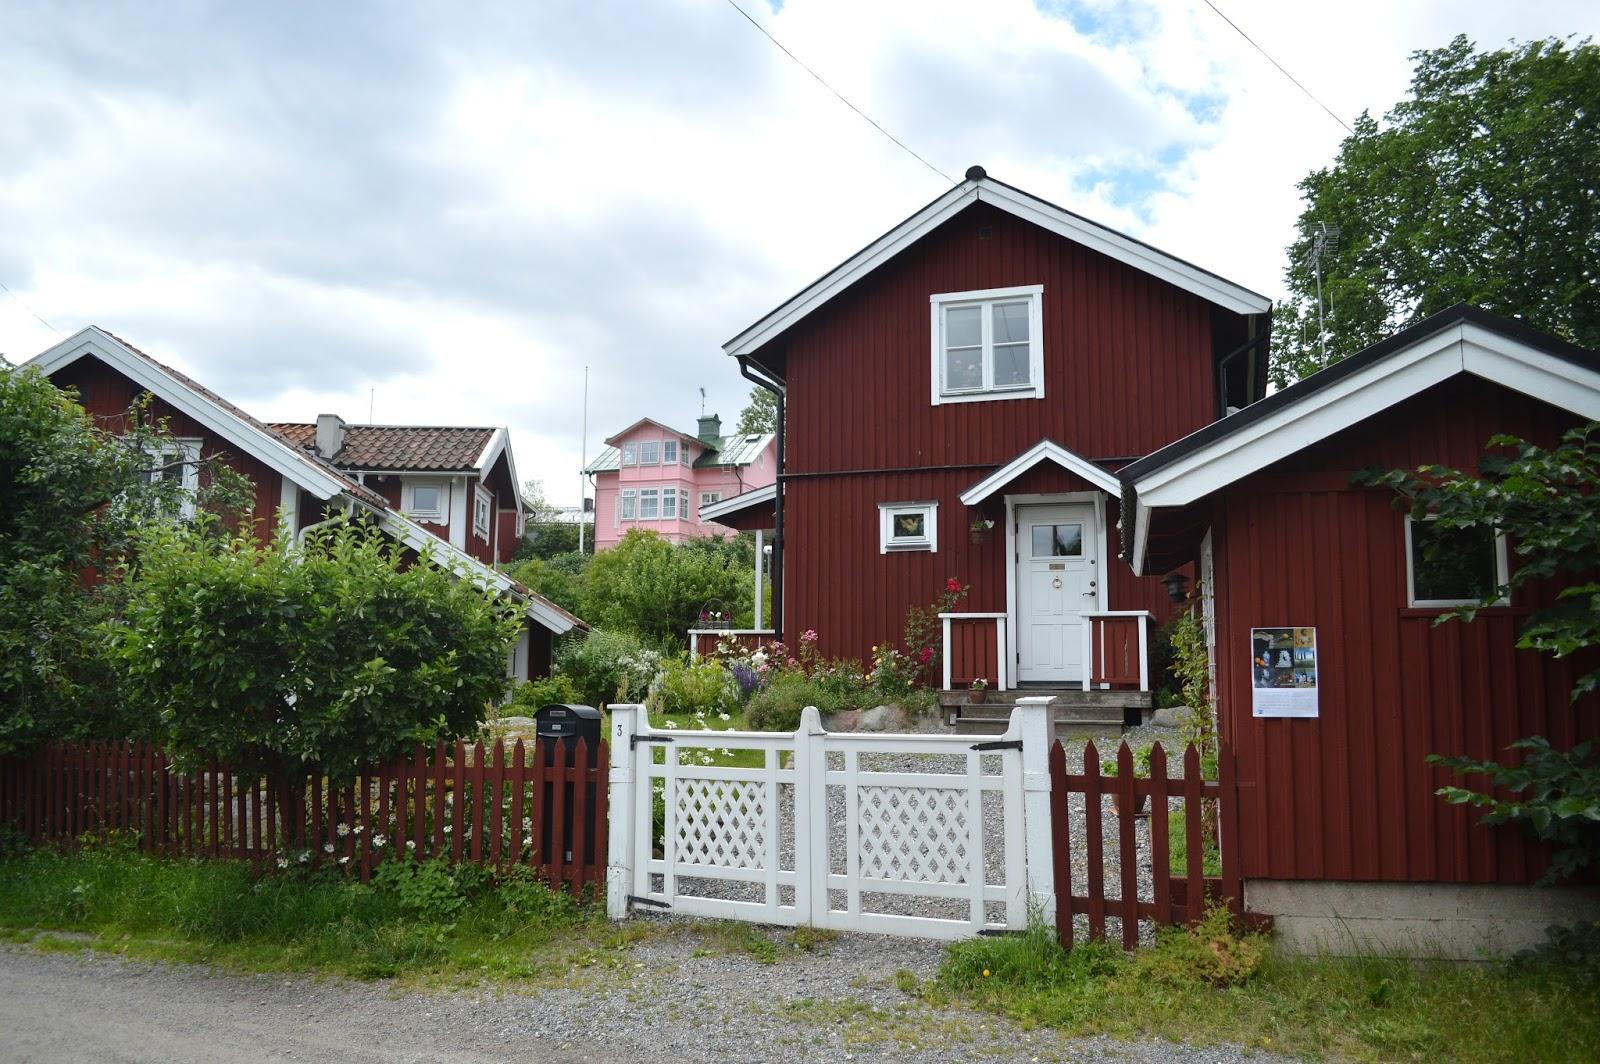 Houses in Vaxholm Stockholm archipelago